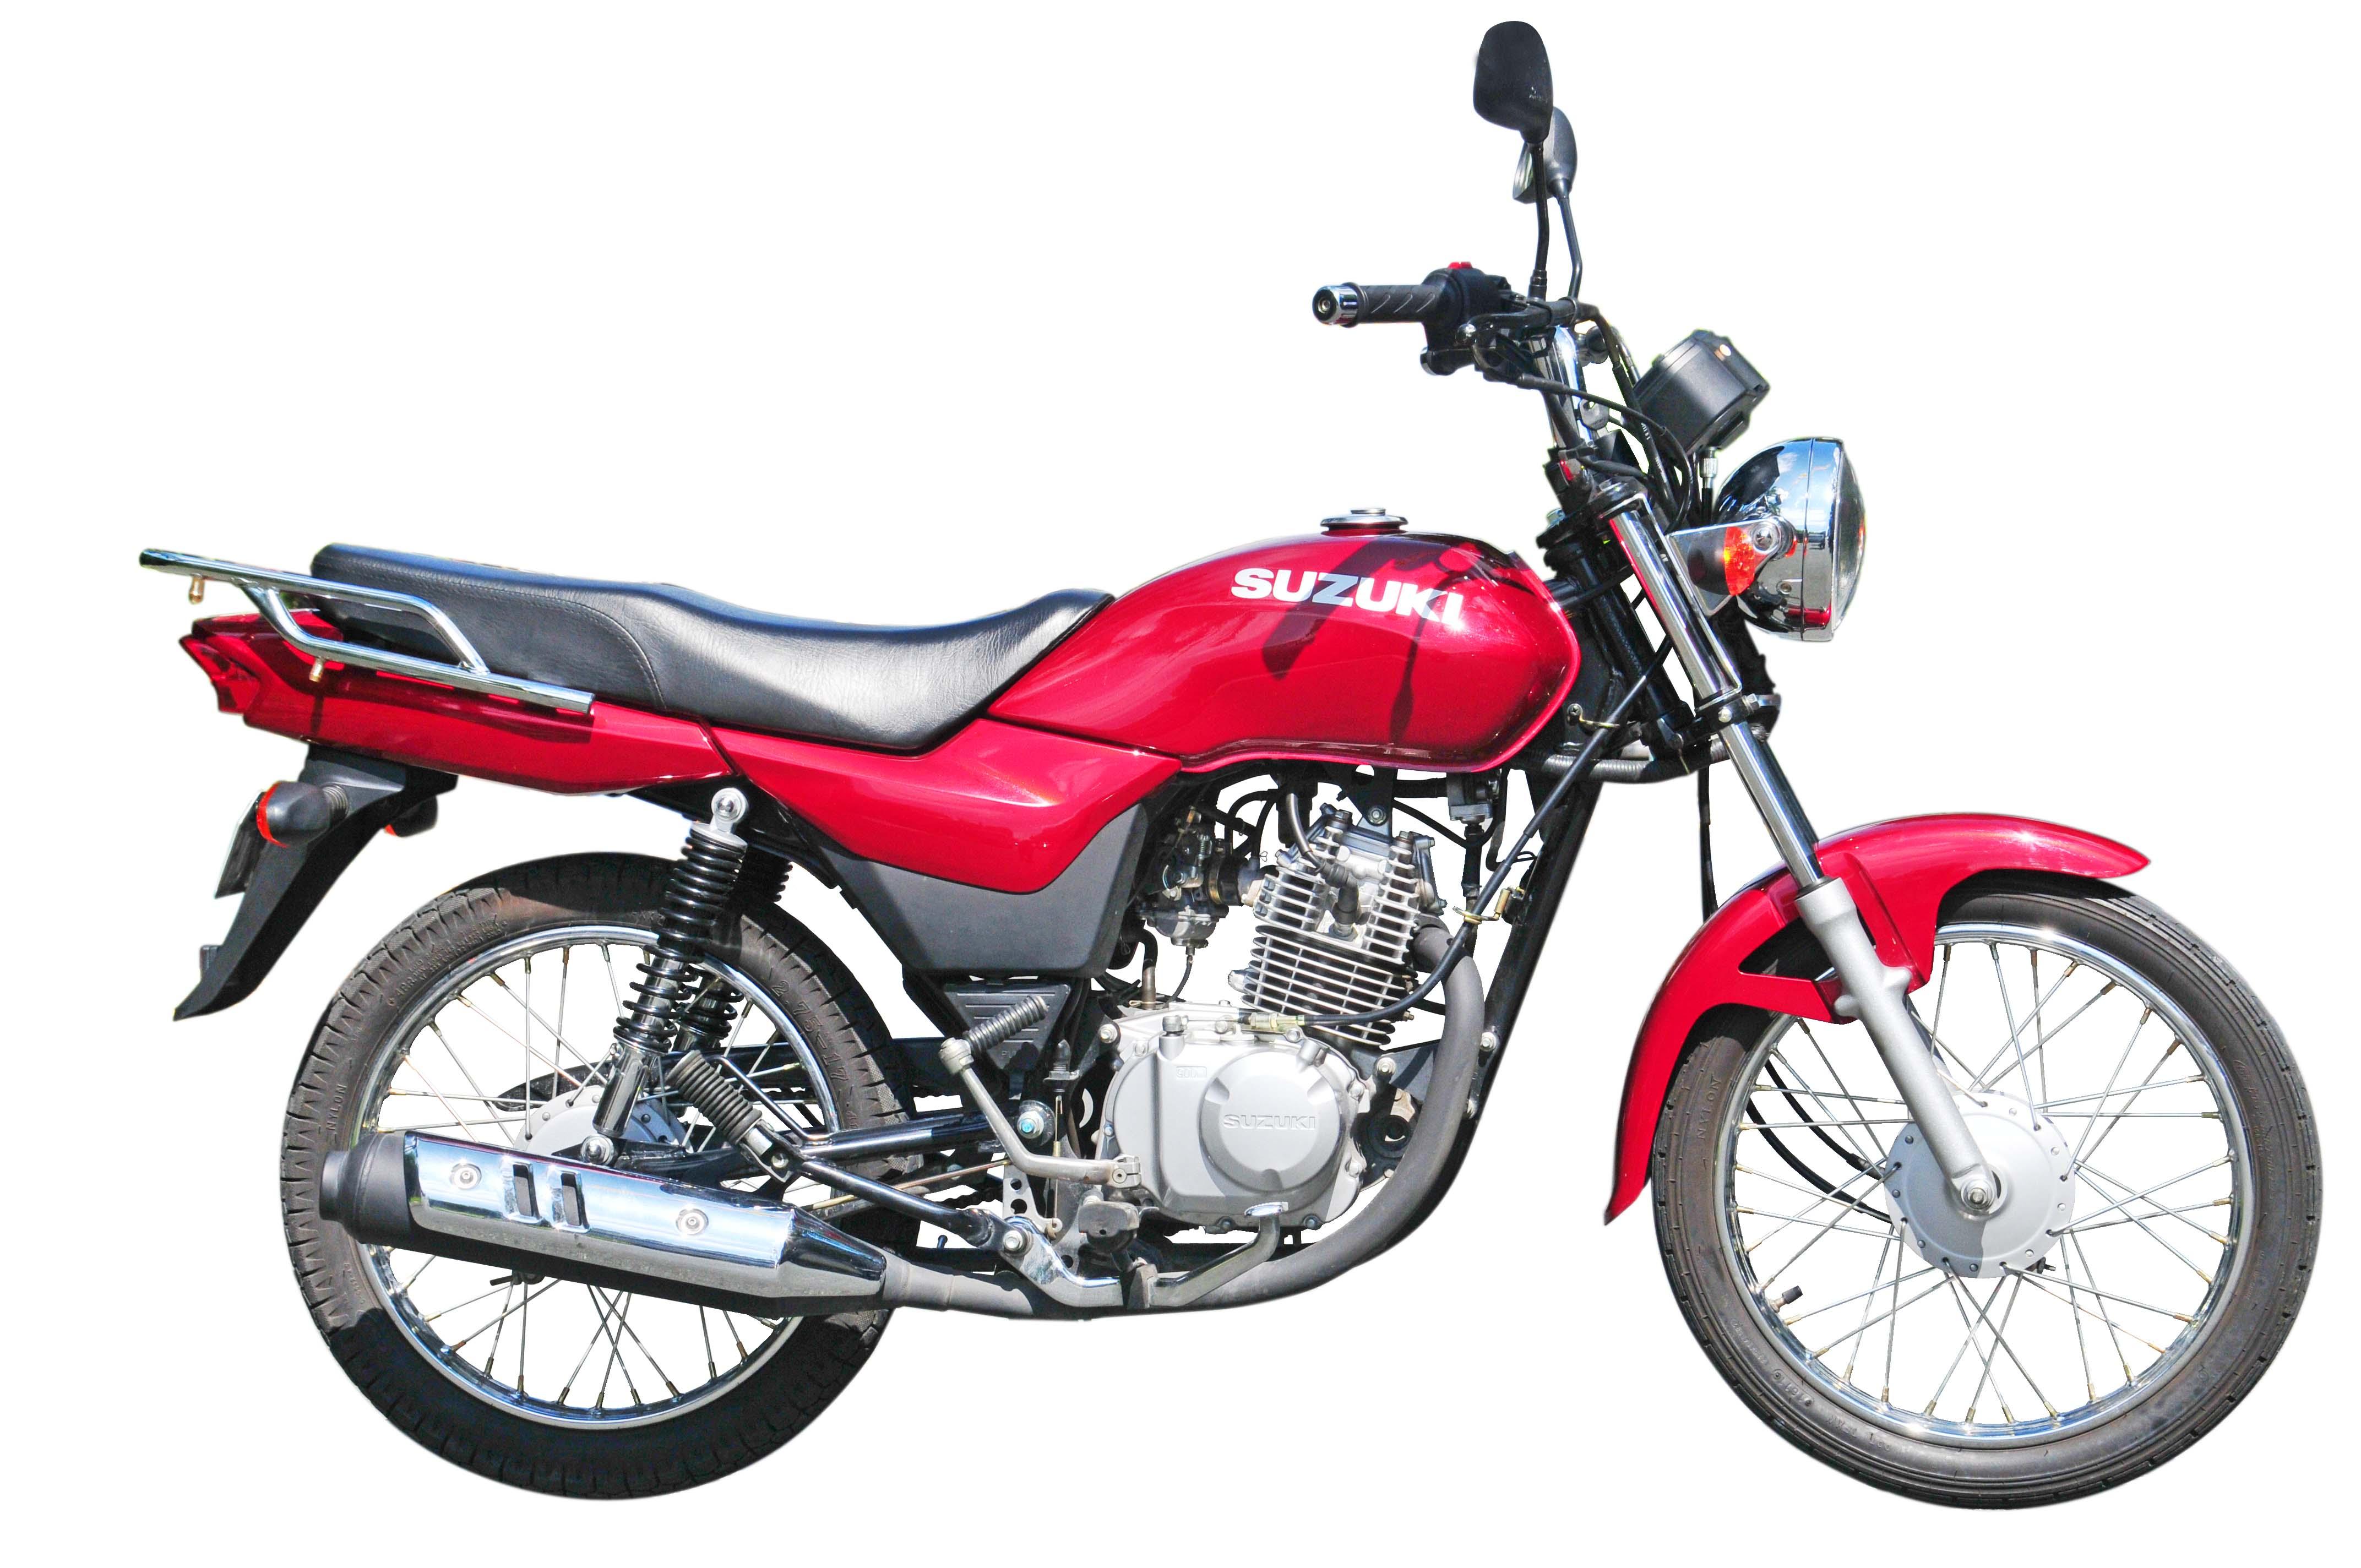 Suzuki gd 110 sports betting alexbetting livemixtapes